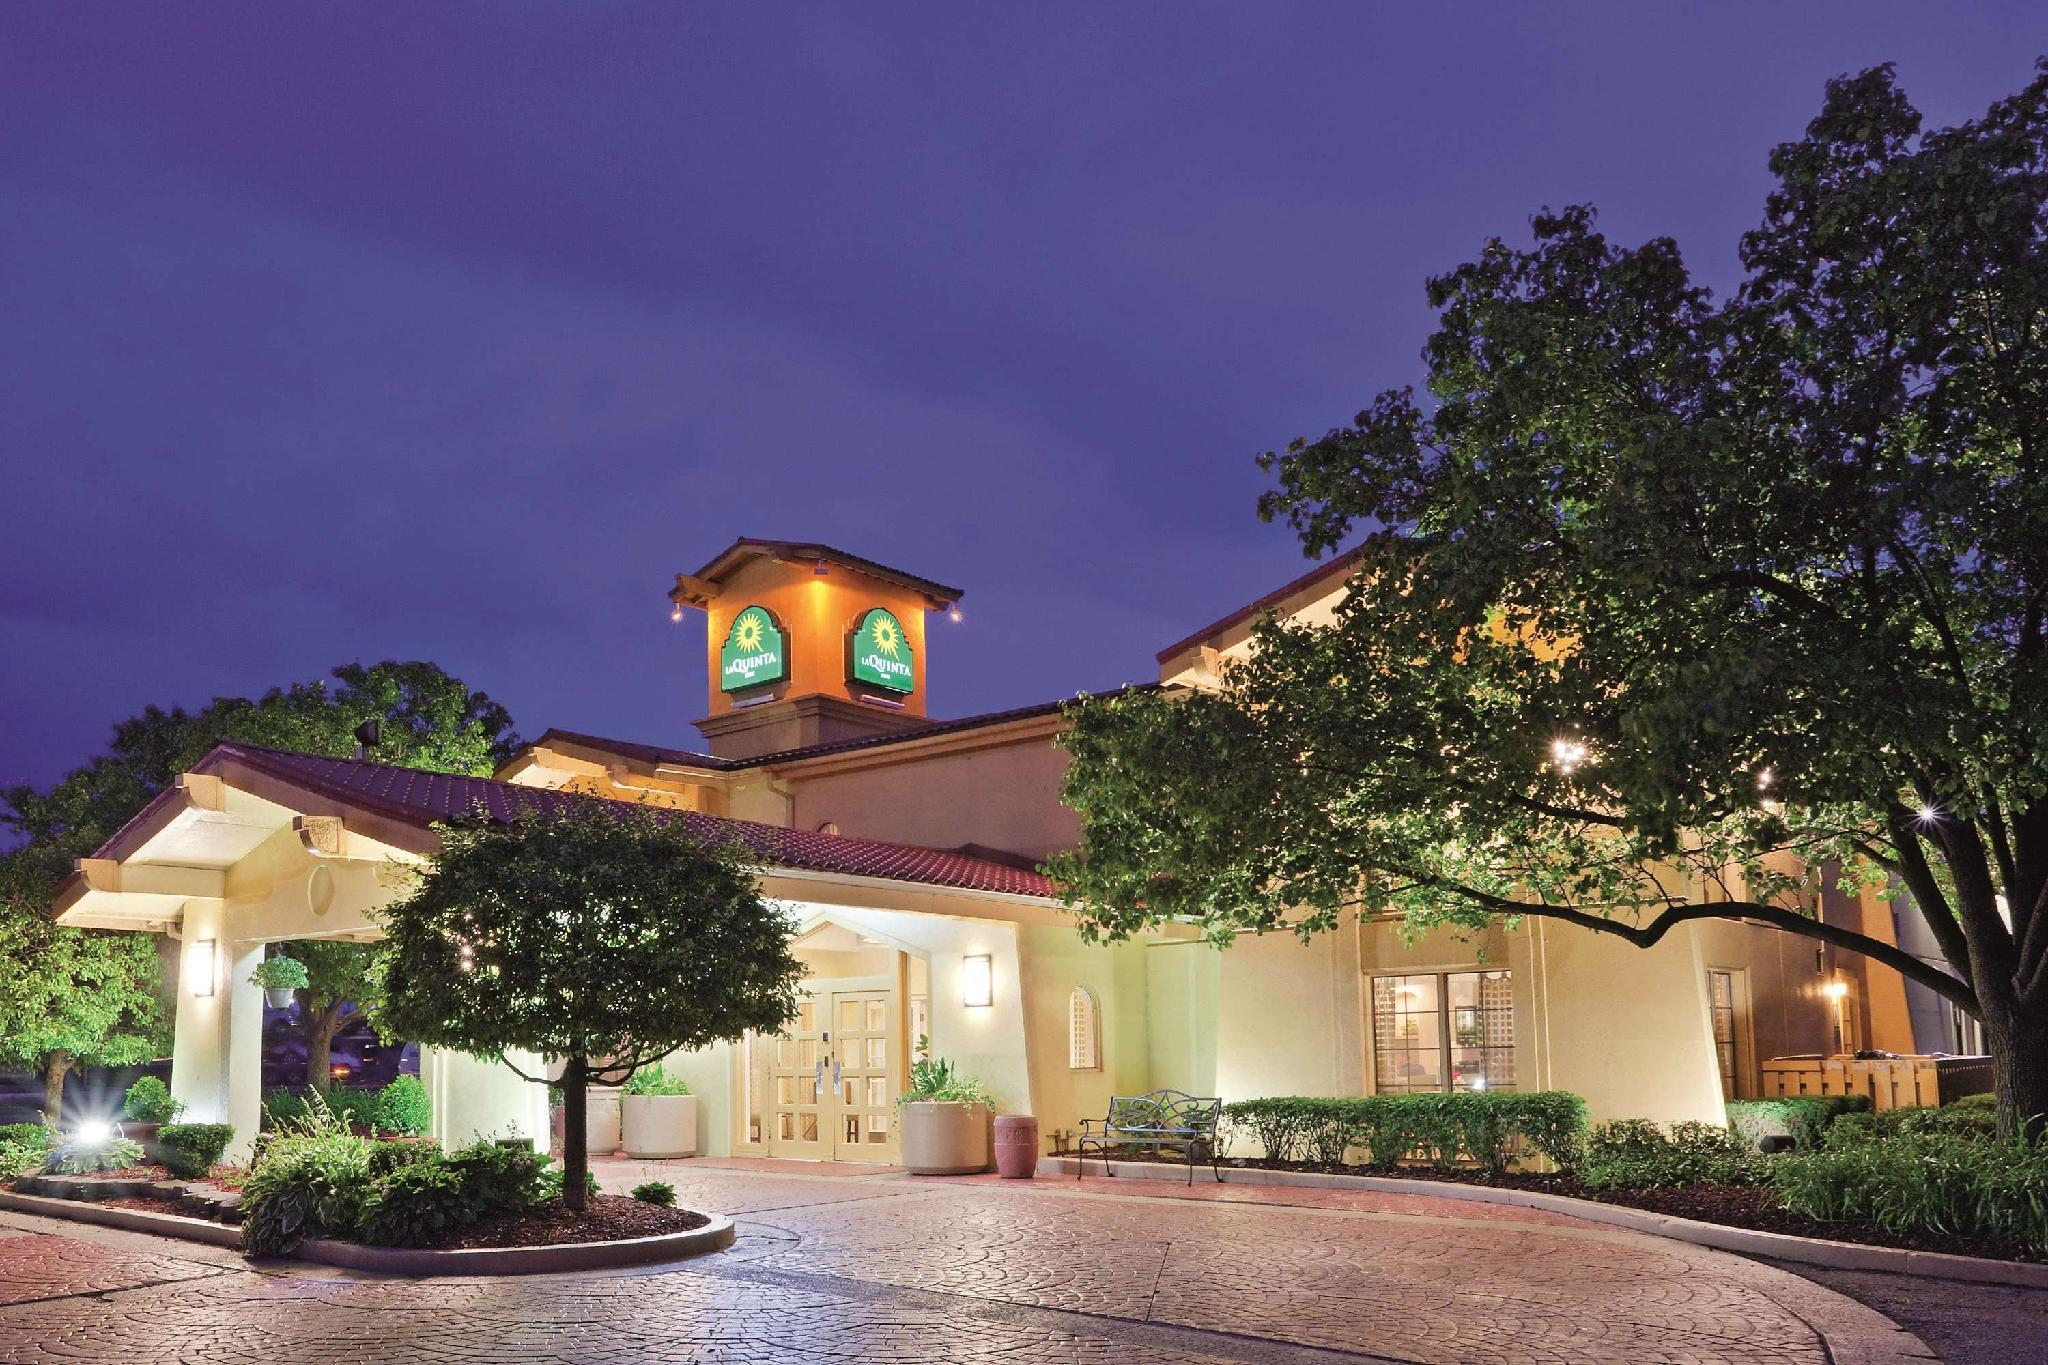 La Quinta Inn By Wyndham Merrillville